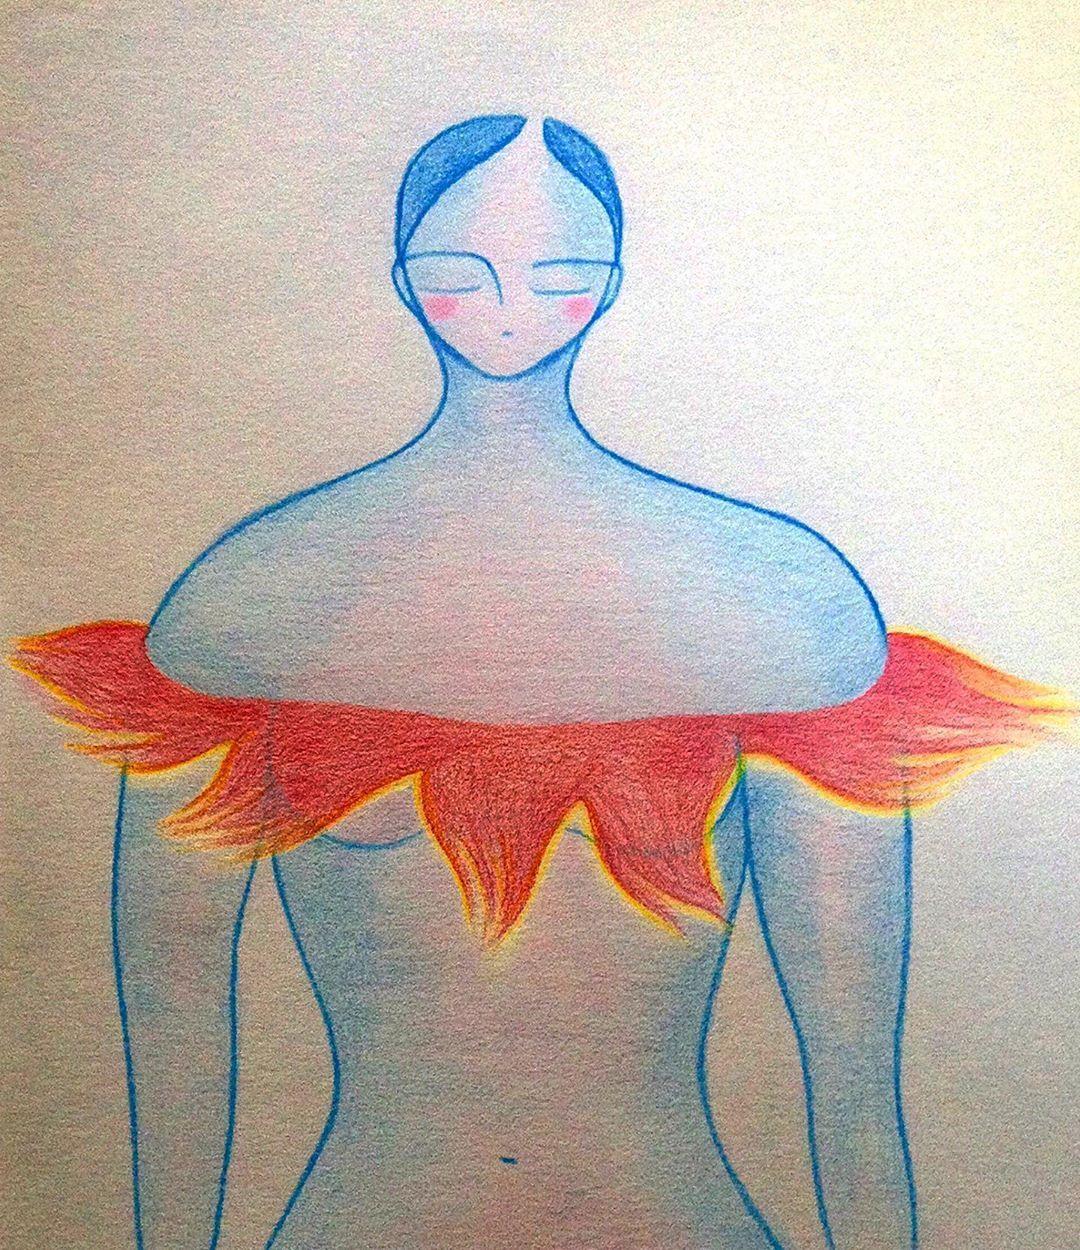 Free drawing. ~ #zeichnenwieatmen #drawingasbreathing #dibujarcomorespirar #kunst #art #arte #zeichnungen #drawings #dibujos #schaffen #create #crear #magischezeichnung #magicdrawing #dibujomagico #magie #magic #magia #genuss #joy #goce #lieben #love #amor #frei #free #libre #danke #thanks #gracias